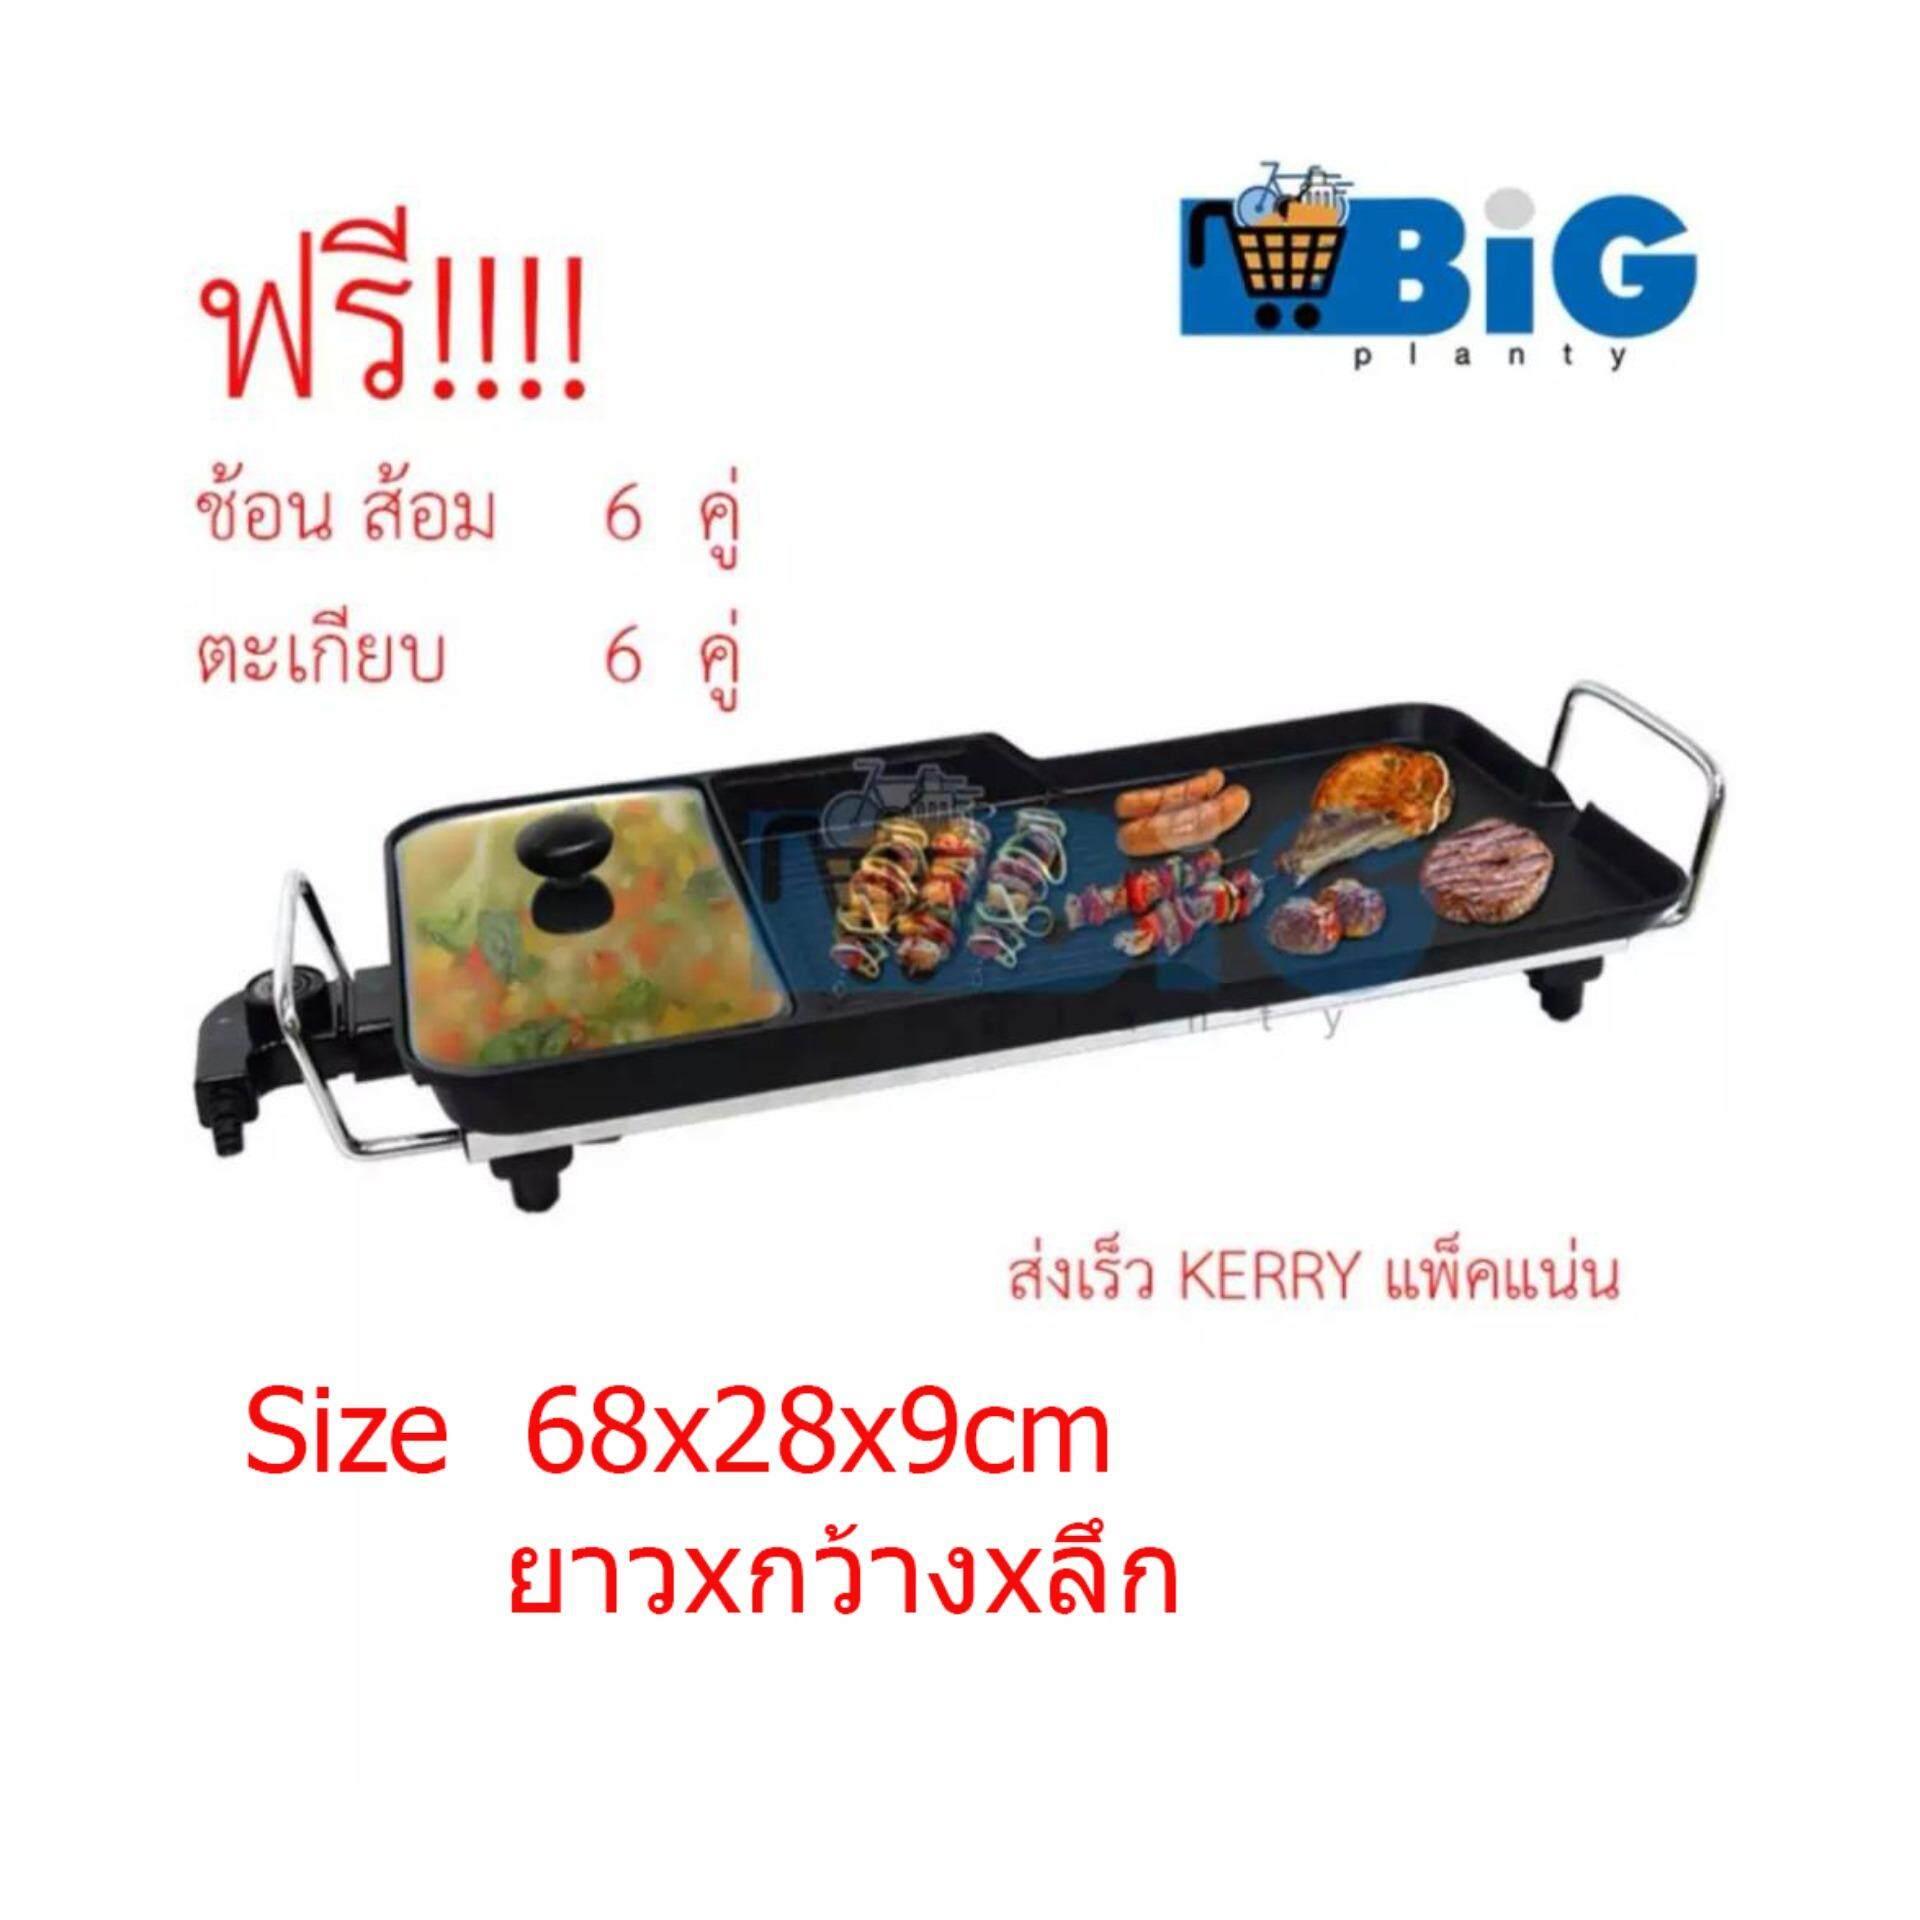 BigPlanty กะทะปิ้งย่าง เตาปิ้งย่าง ชาบู ไม่ติดกะทะ แบบขนาดยาวมีหม้อที่ขอบ NO.6550  แถมฟรี!!!! ช้อน ส้อม 6 คู่ ตะเกียบ 6 คู่